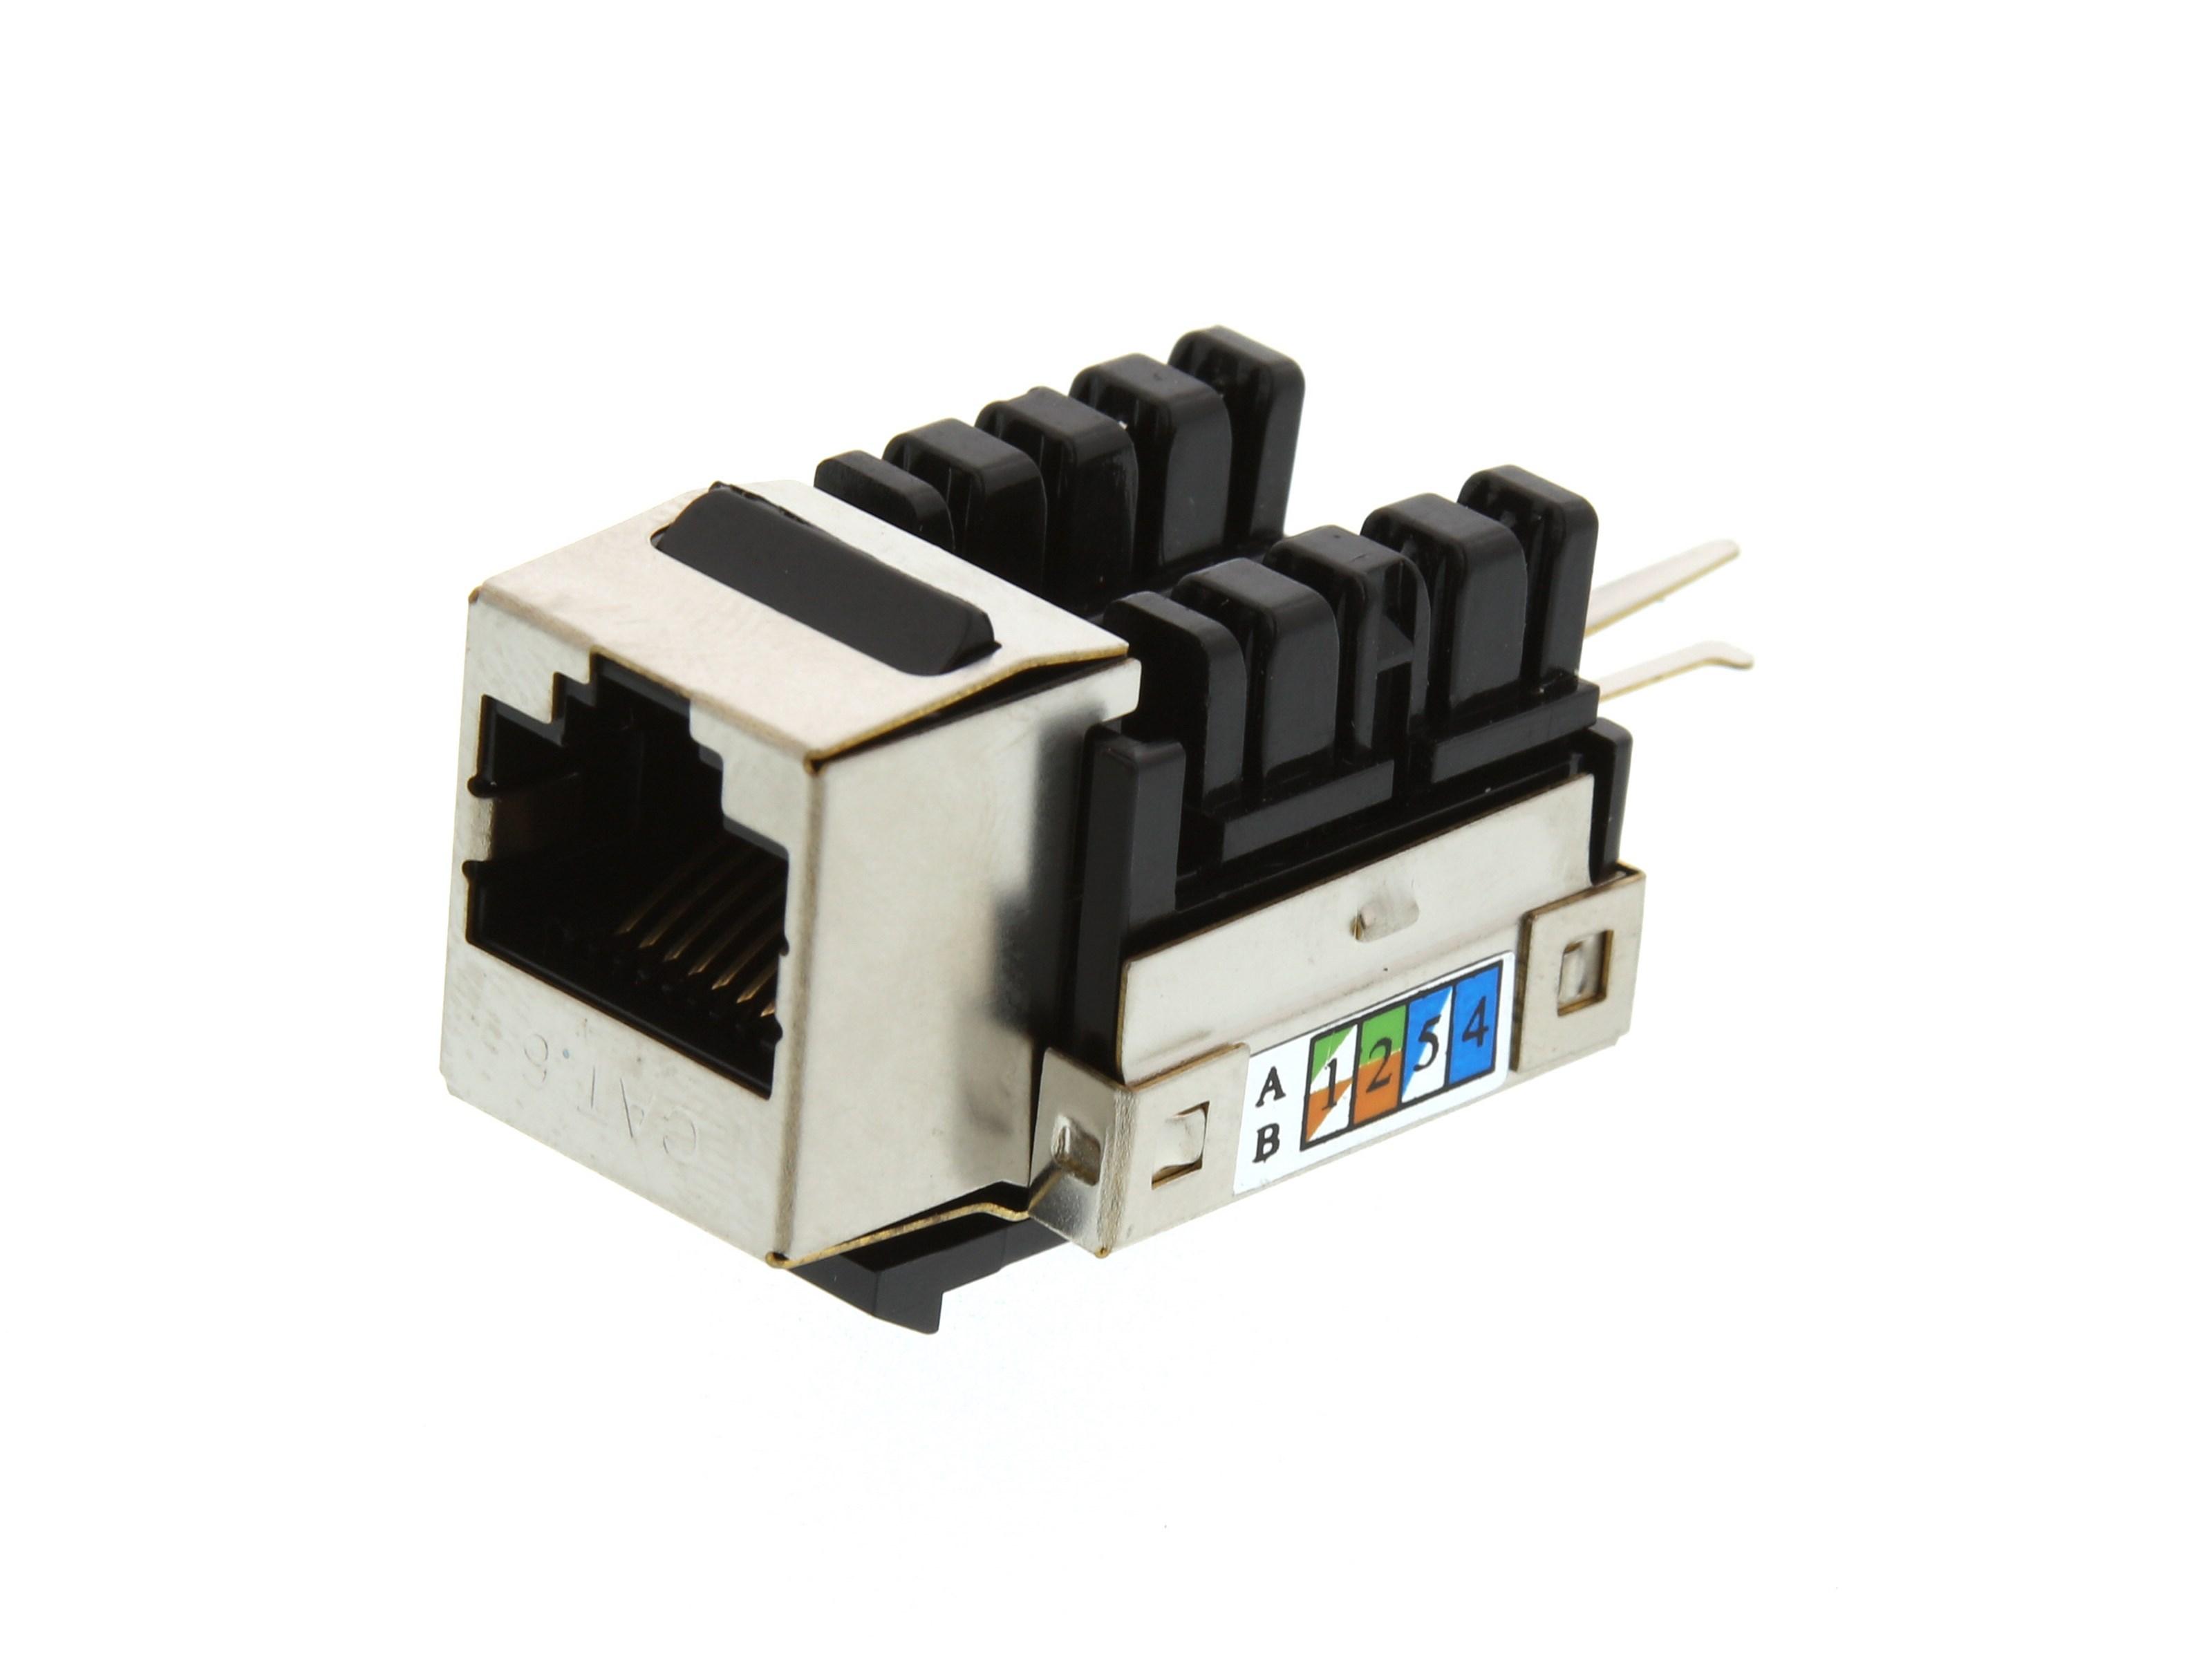 Ivory 2 Pack Lot CAT5e RJ45 110 Punch Down Keystone Modular Snap-In Jacks